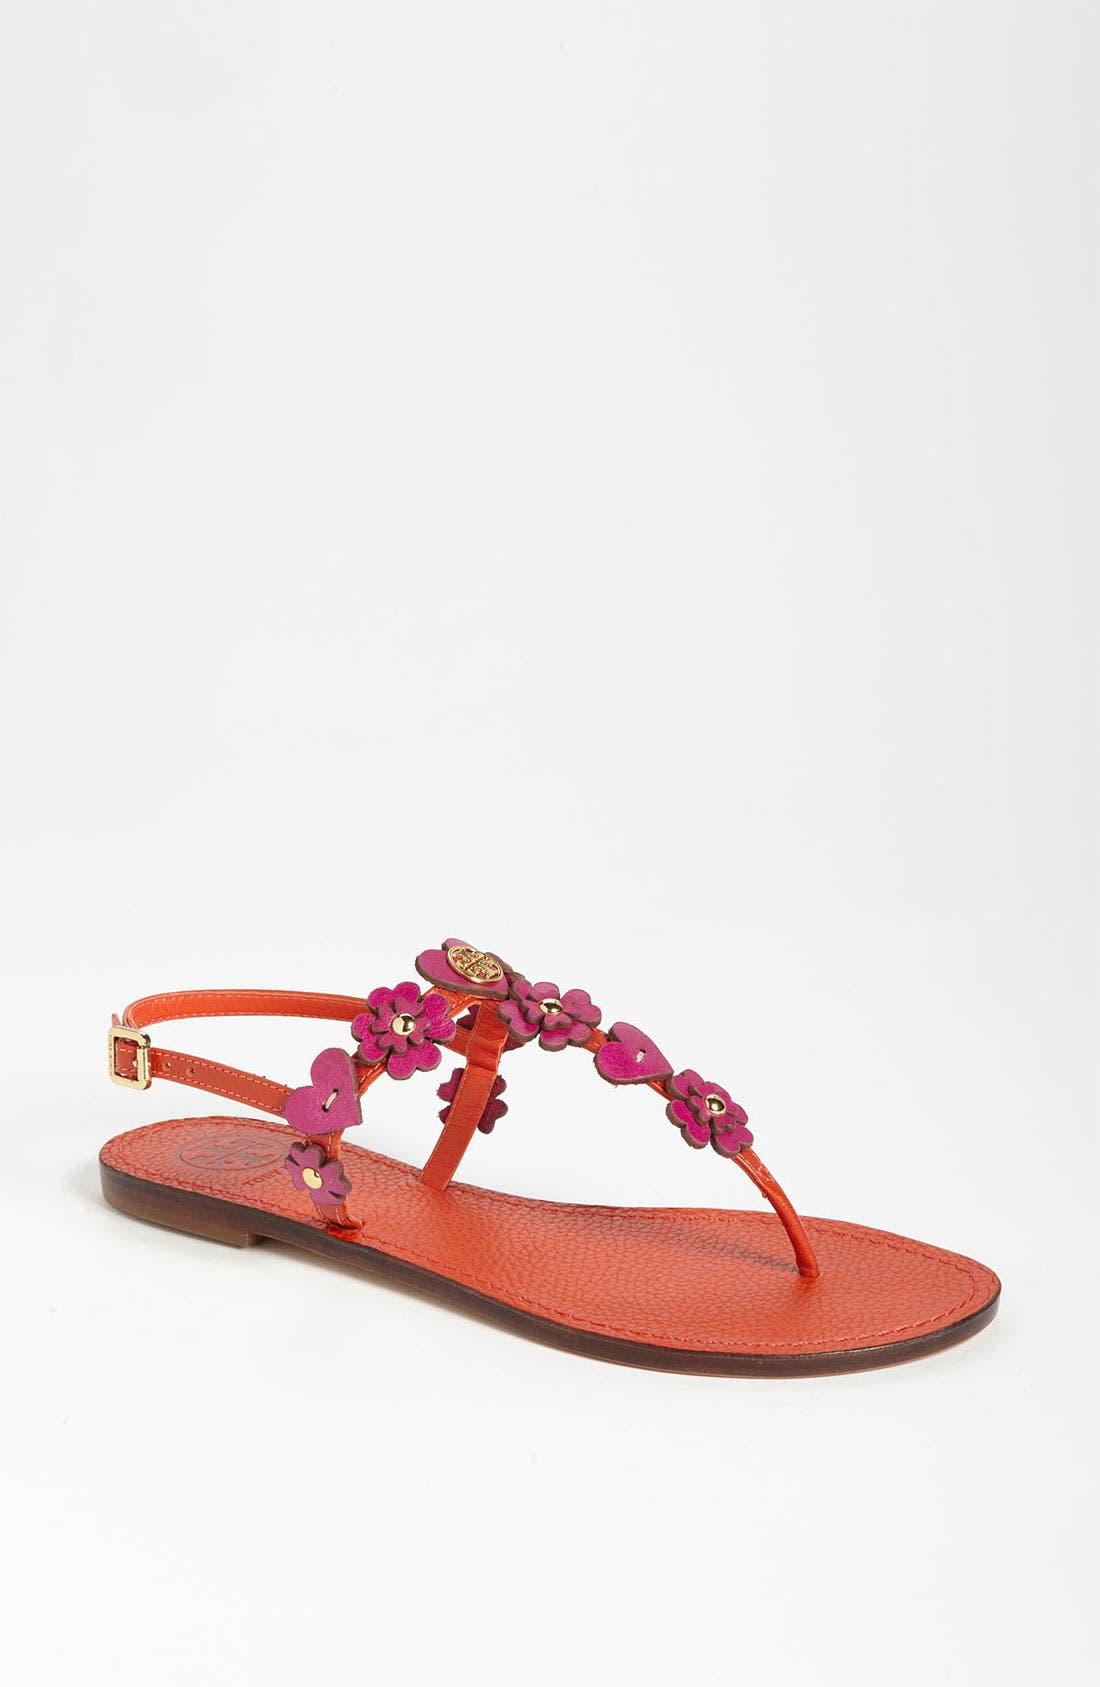 Main Image - Tory Burch 'Cori' Thong Sandal